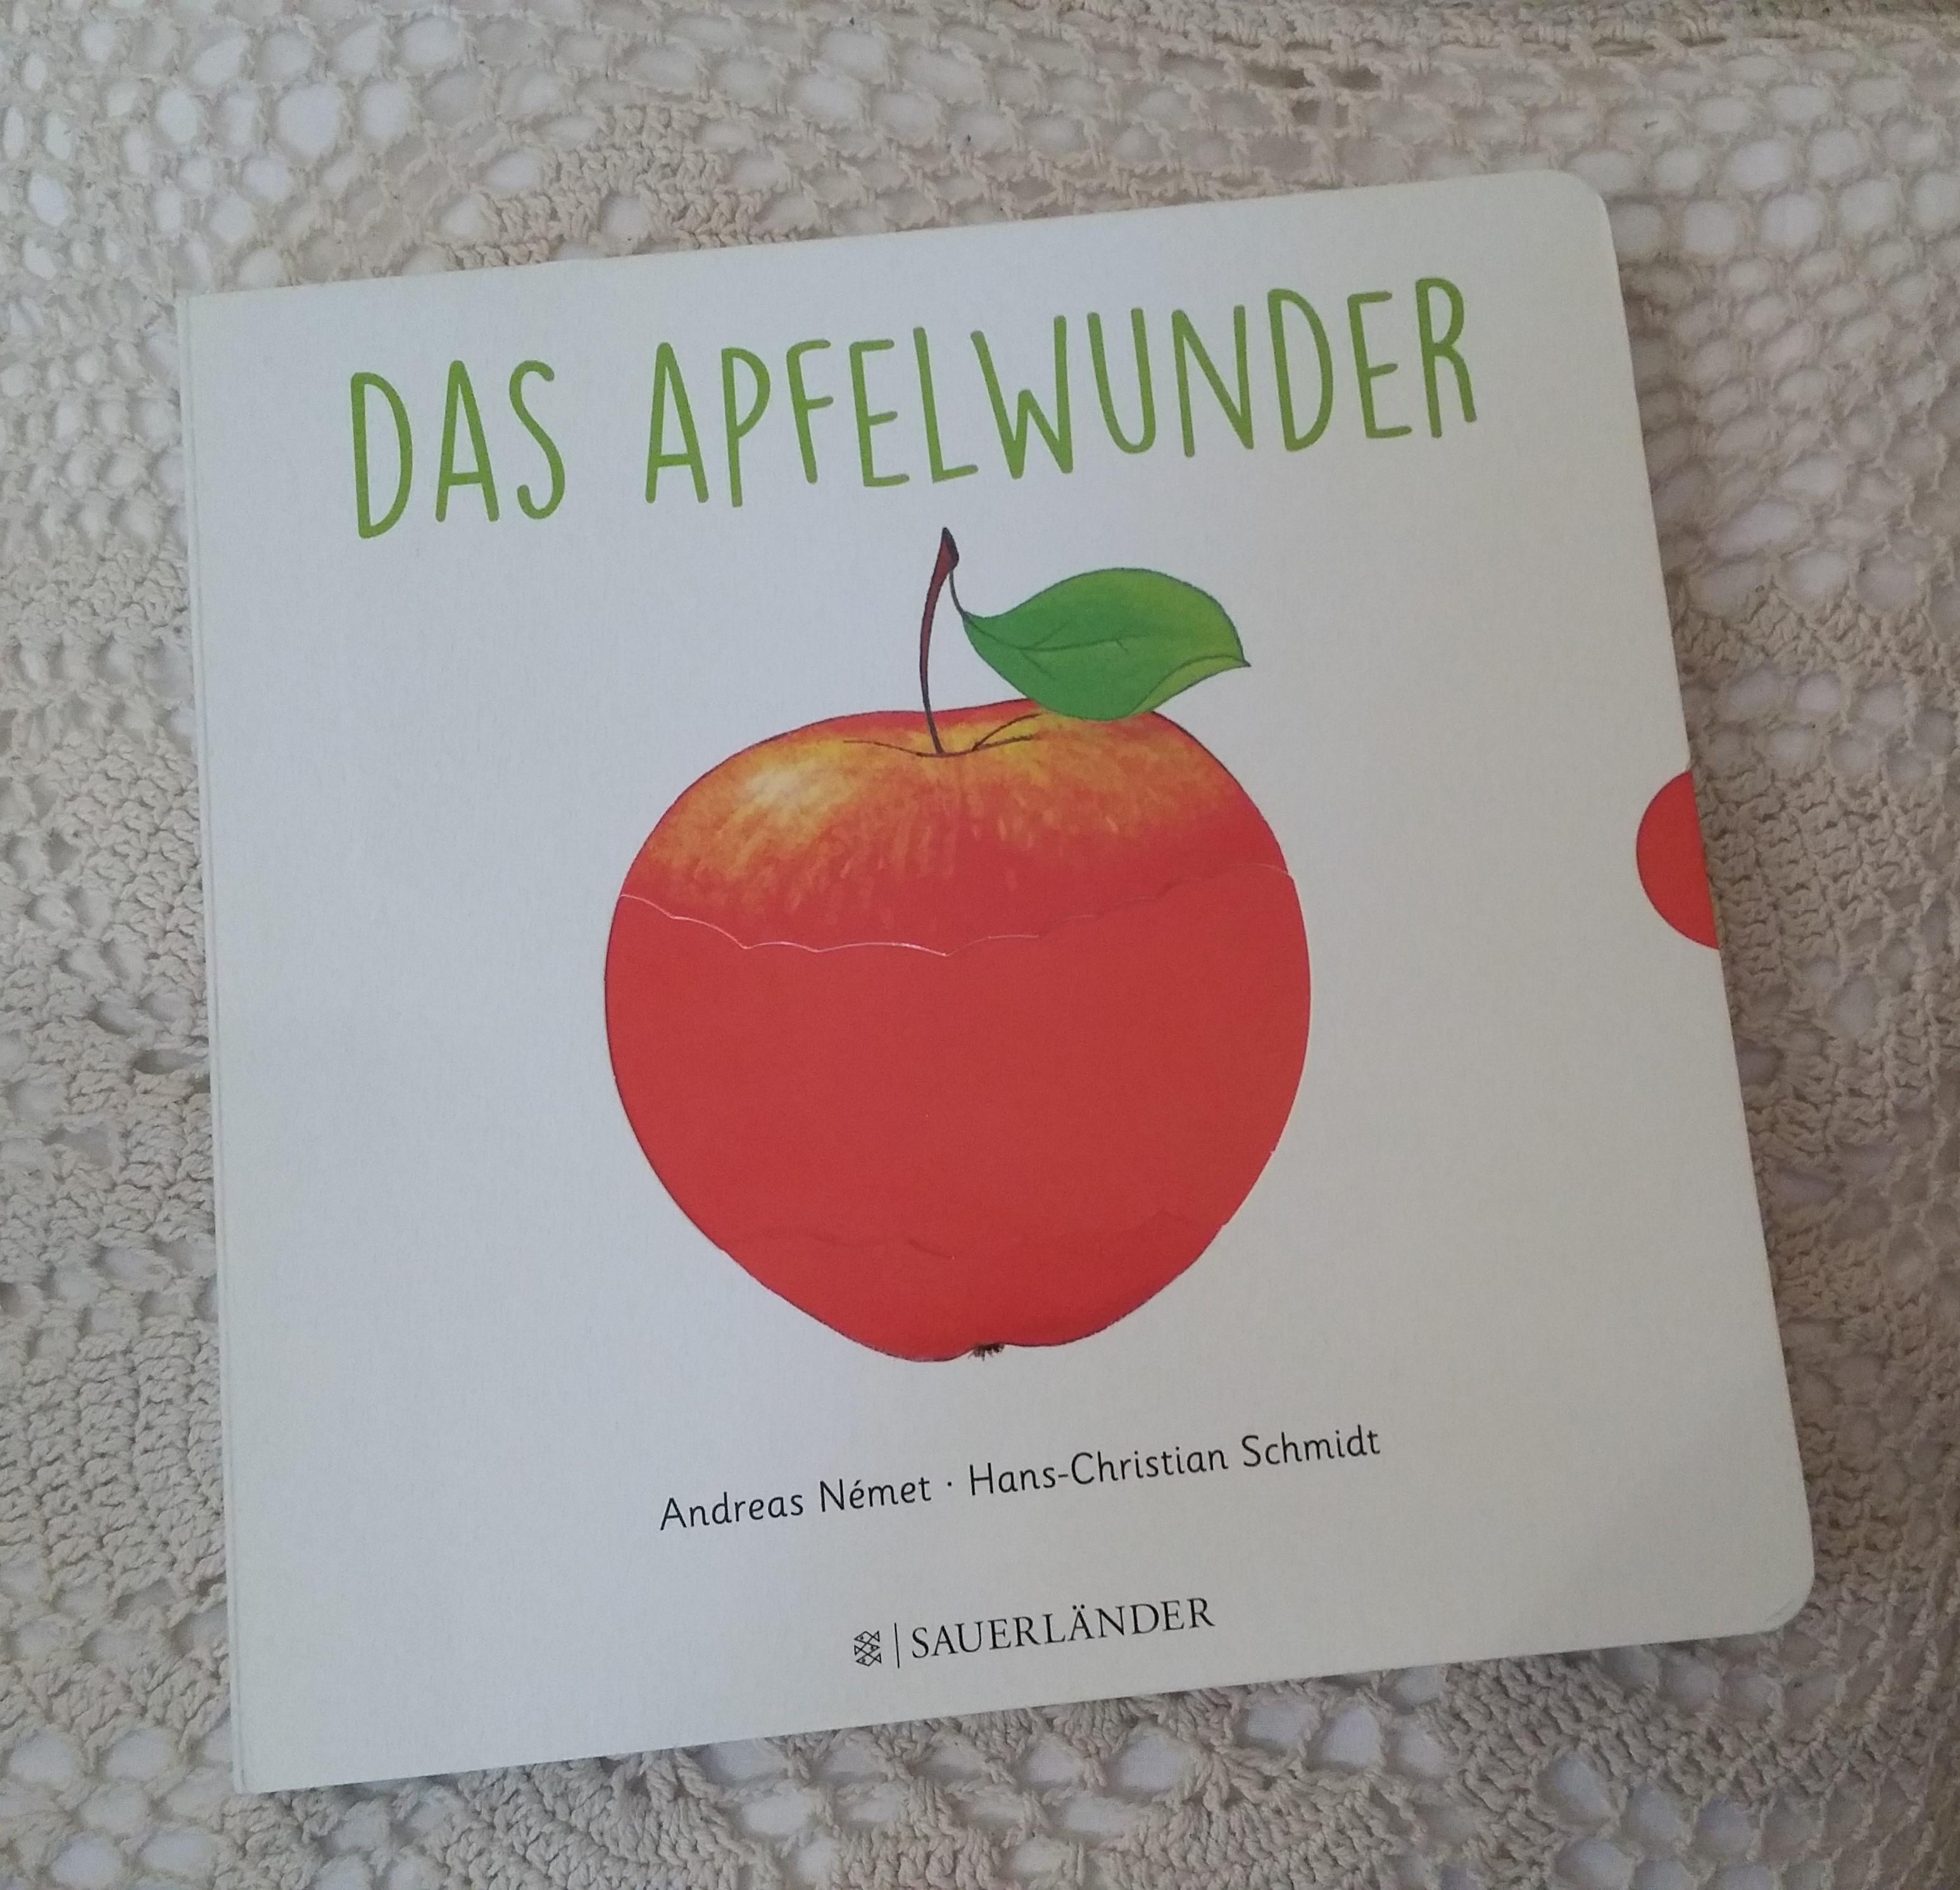 Das Apfelwunder Book Cover